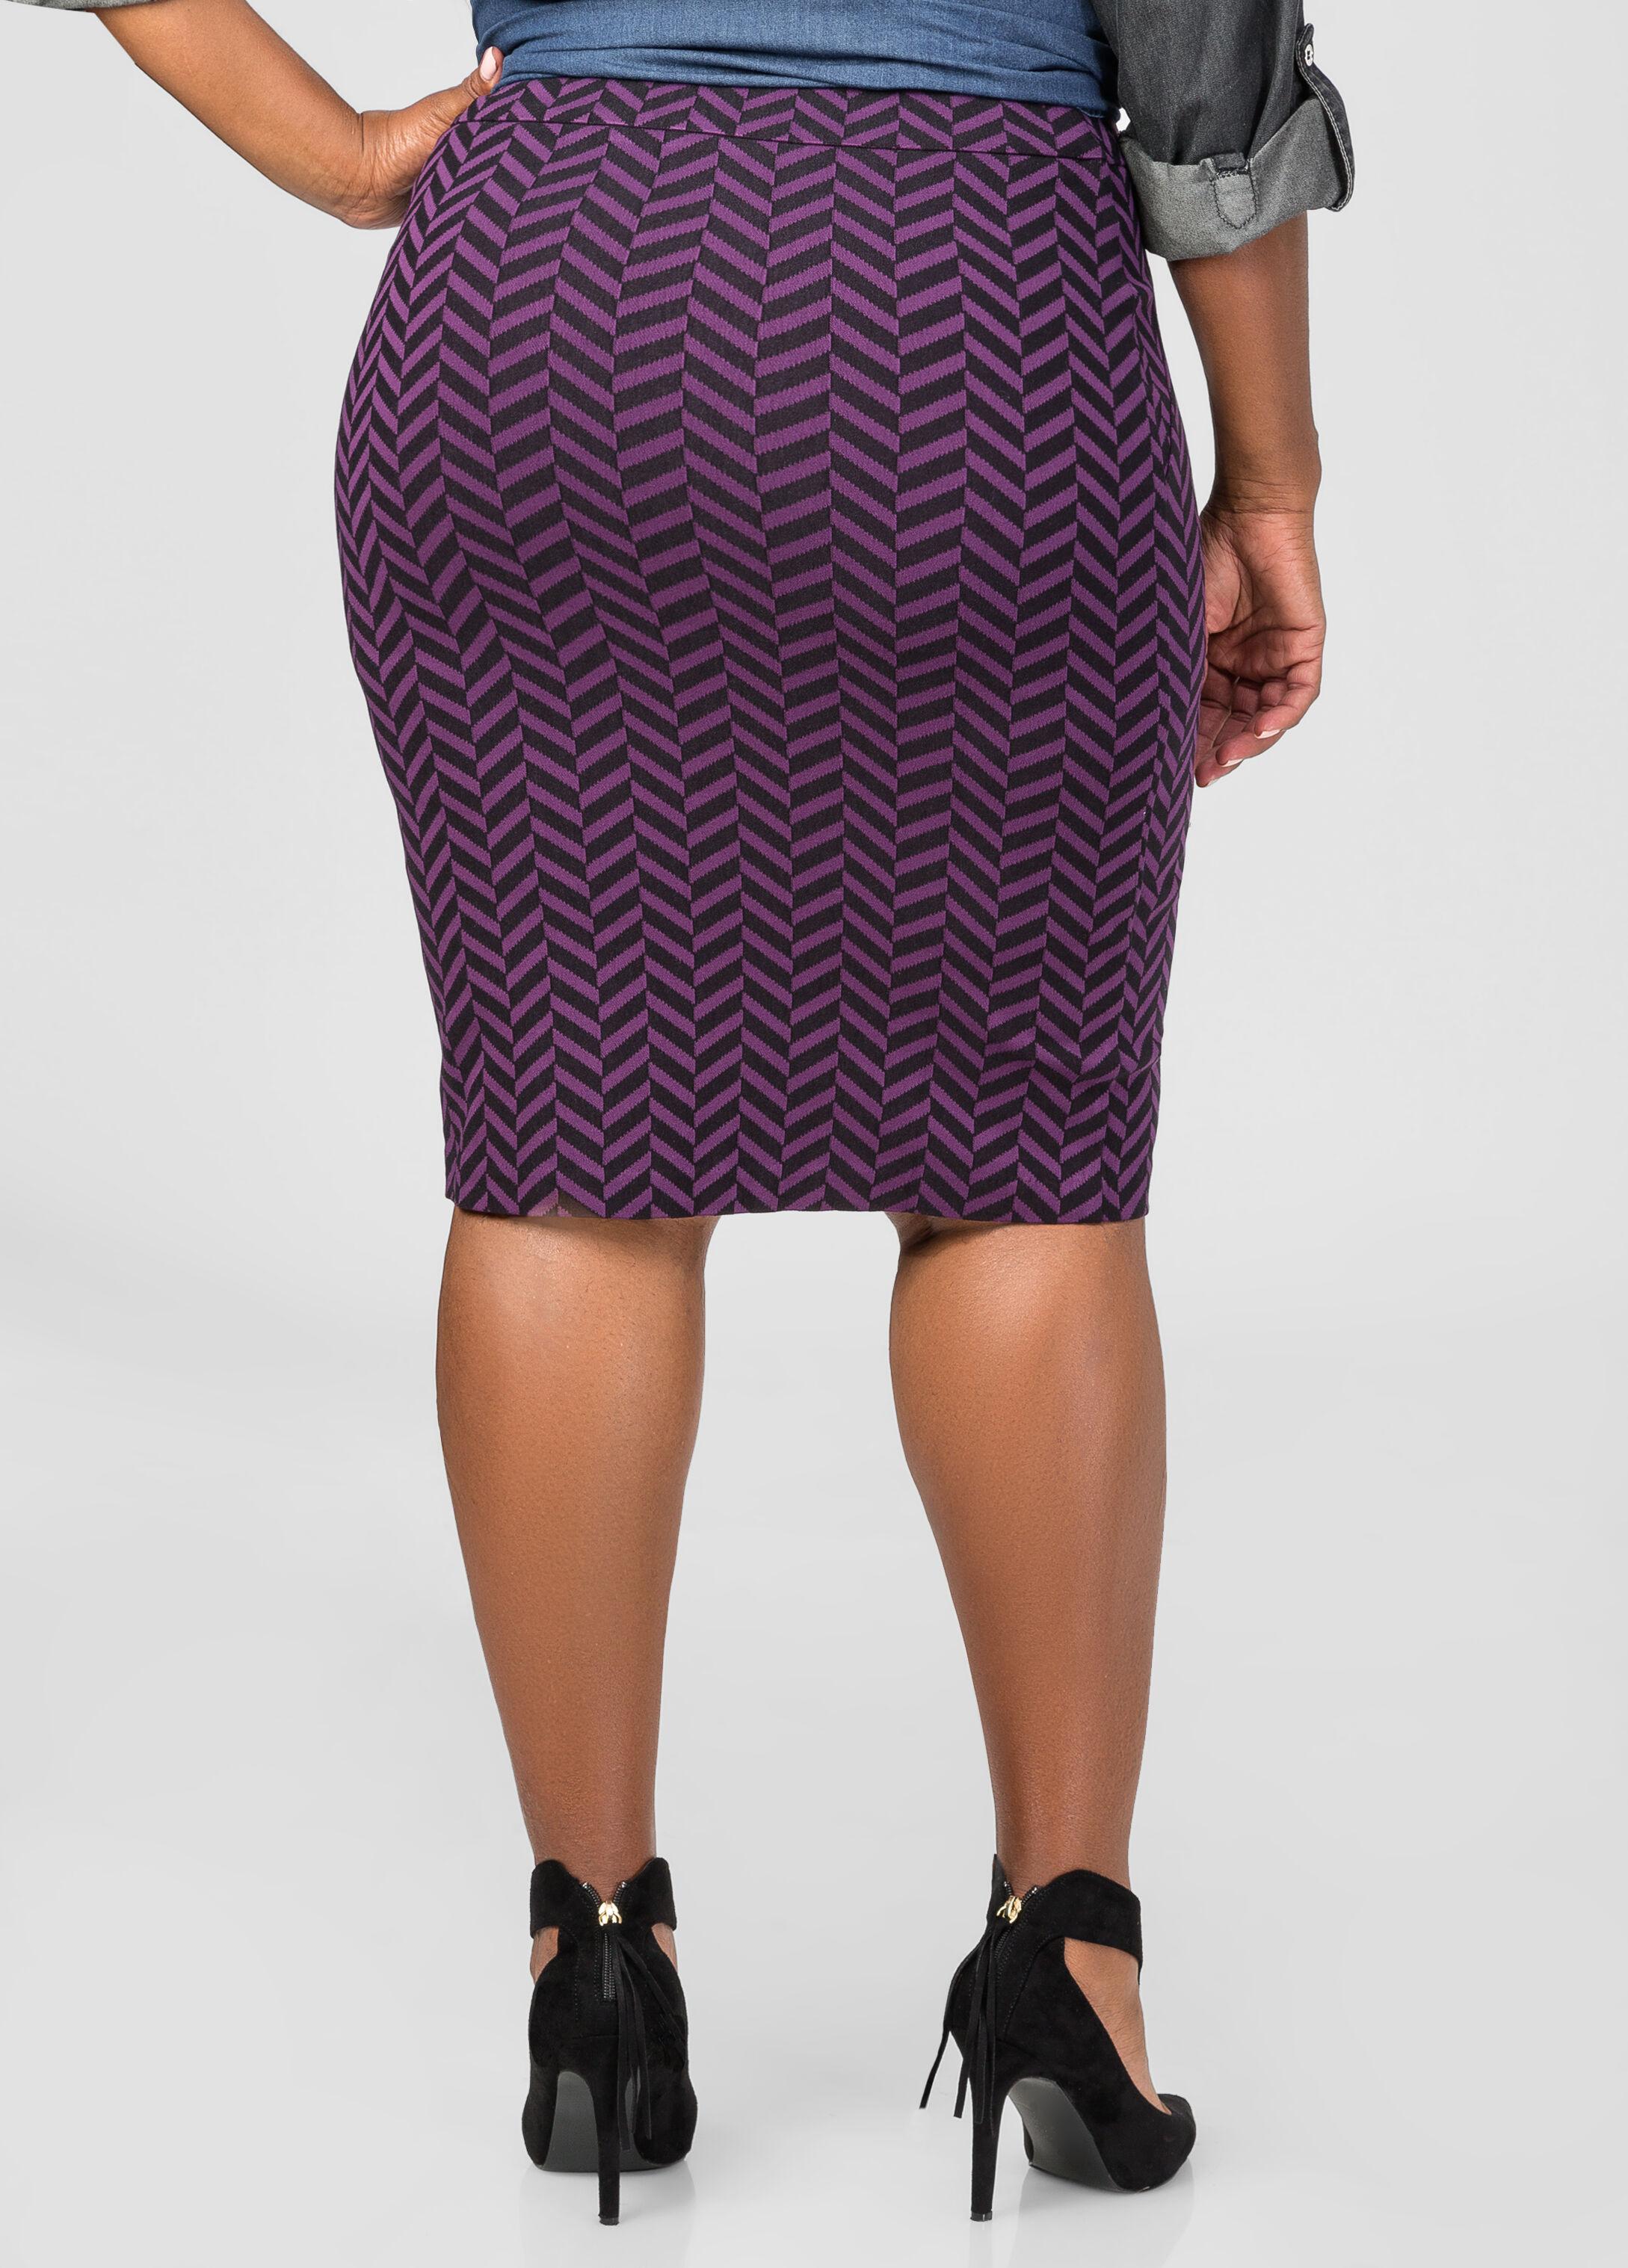 Chevron Pencil Skirt